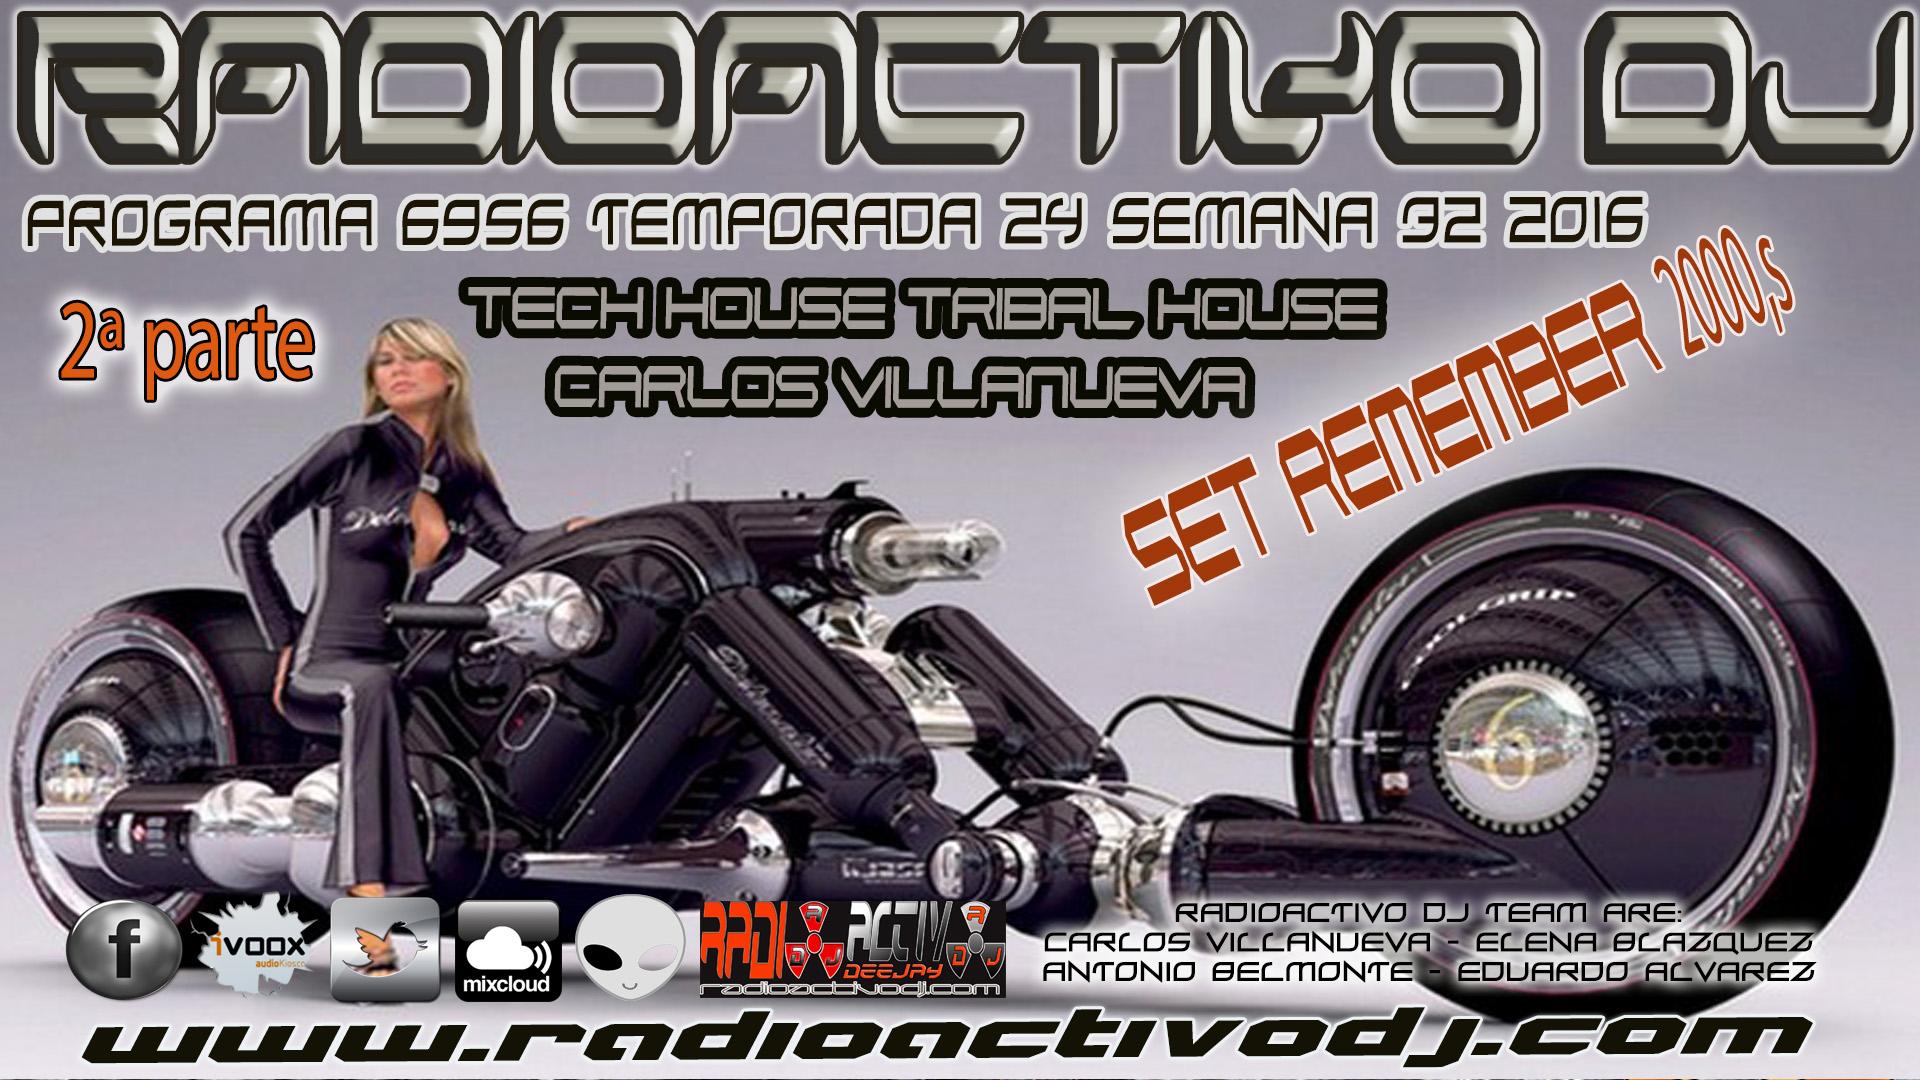 RADIOACTIVO-DJ-32-2016